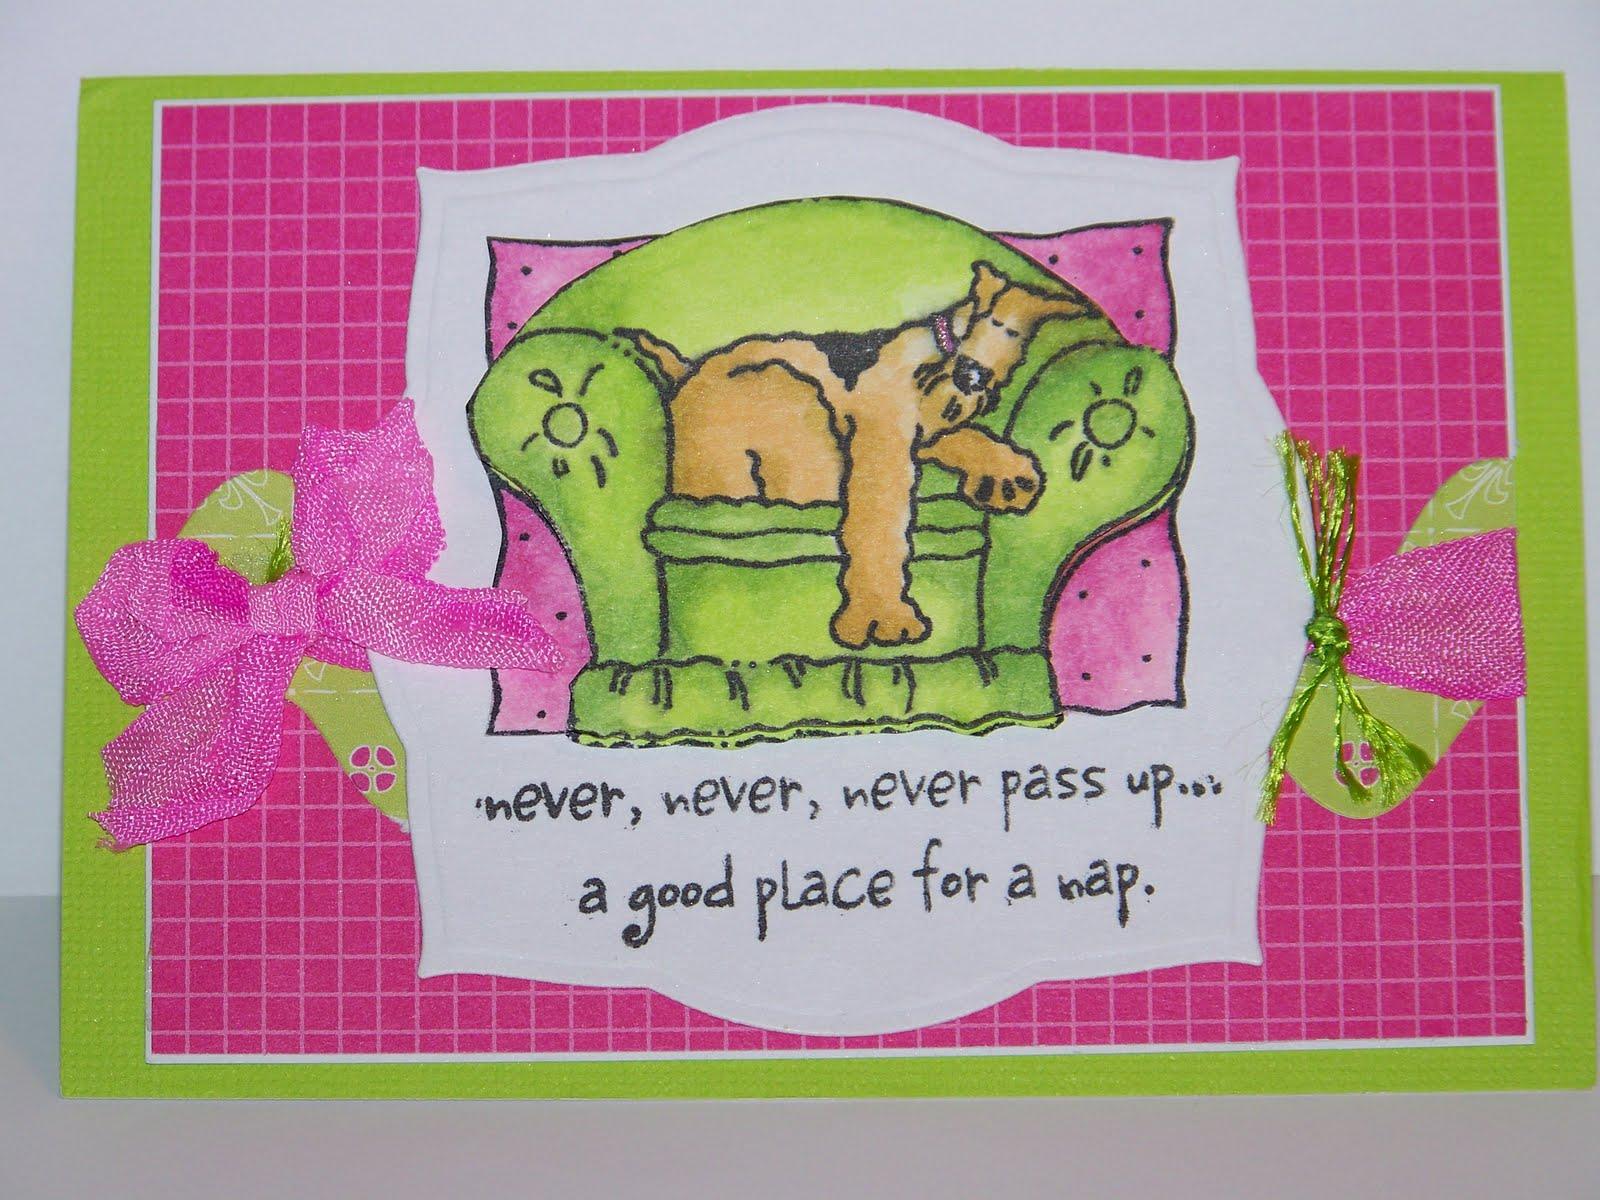 Gypsy s 1st Birthday card & handmade at that